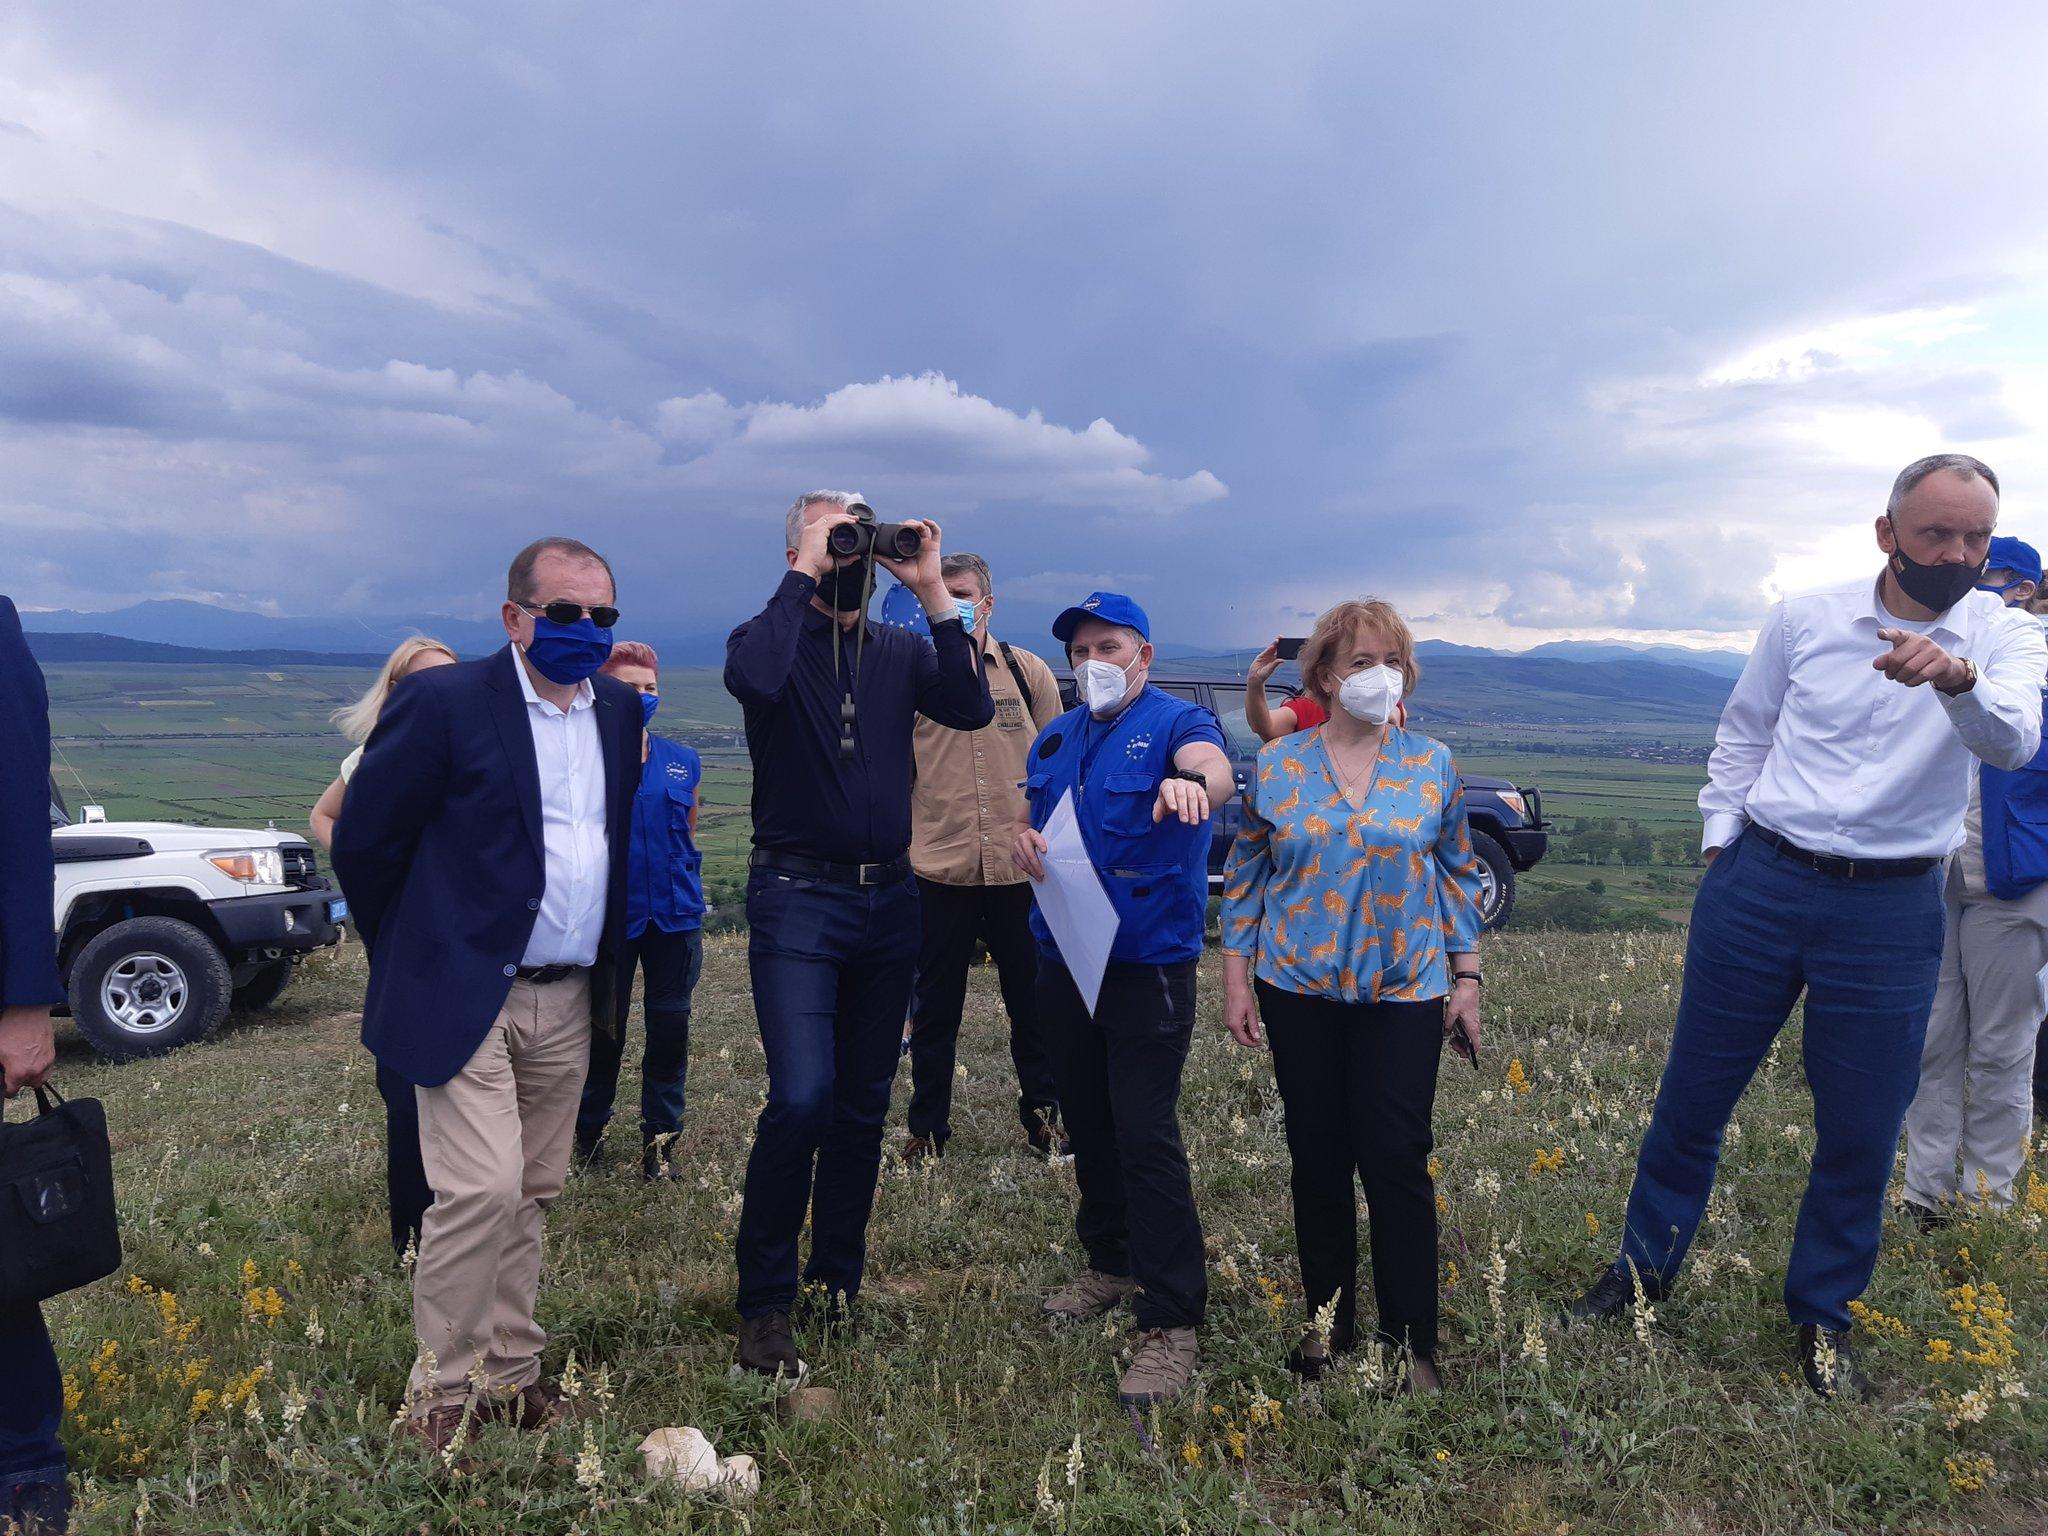 E3hcg0LWEAI862C #новости Гитанас Науседа, Грузия-Литва, Хурвалети